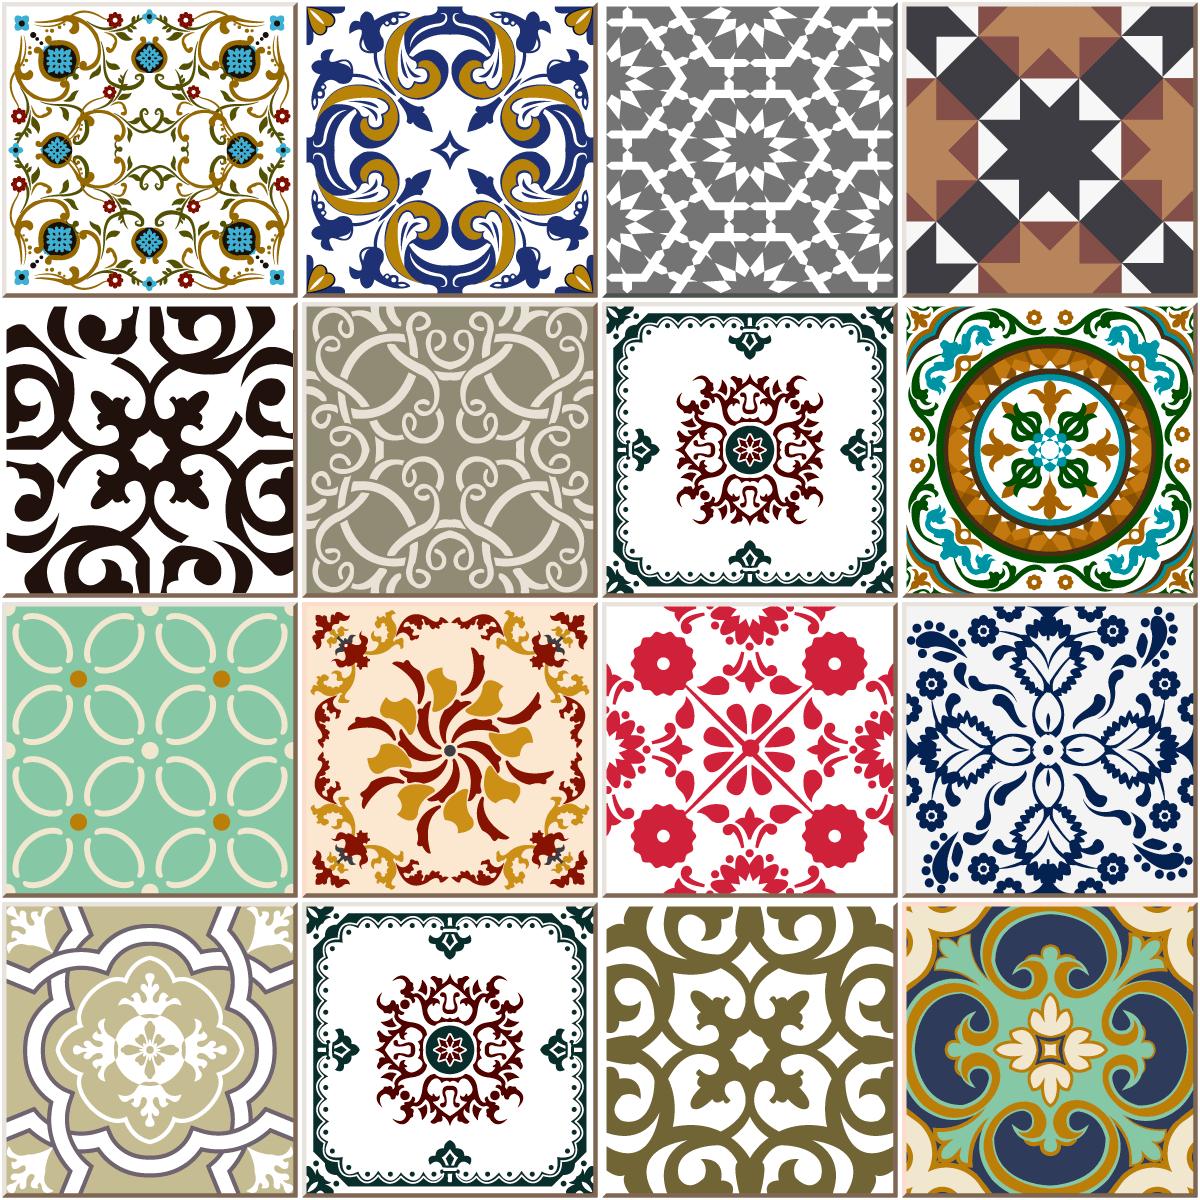 Stickers Carrelages Azulejos Style Design Coloré Art Et Design - Carrelage i colori